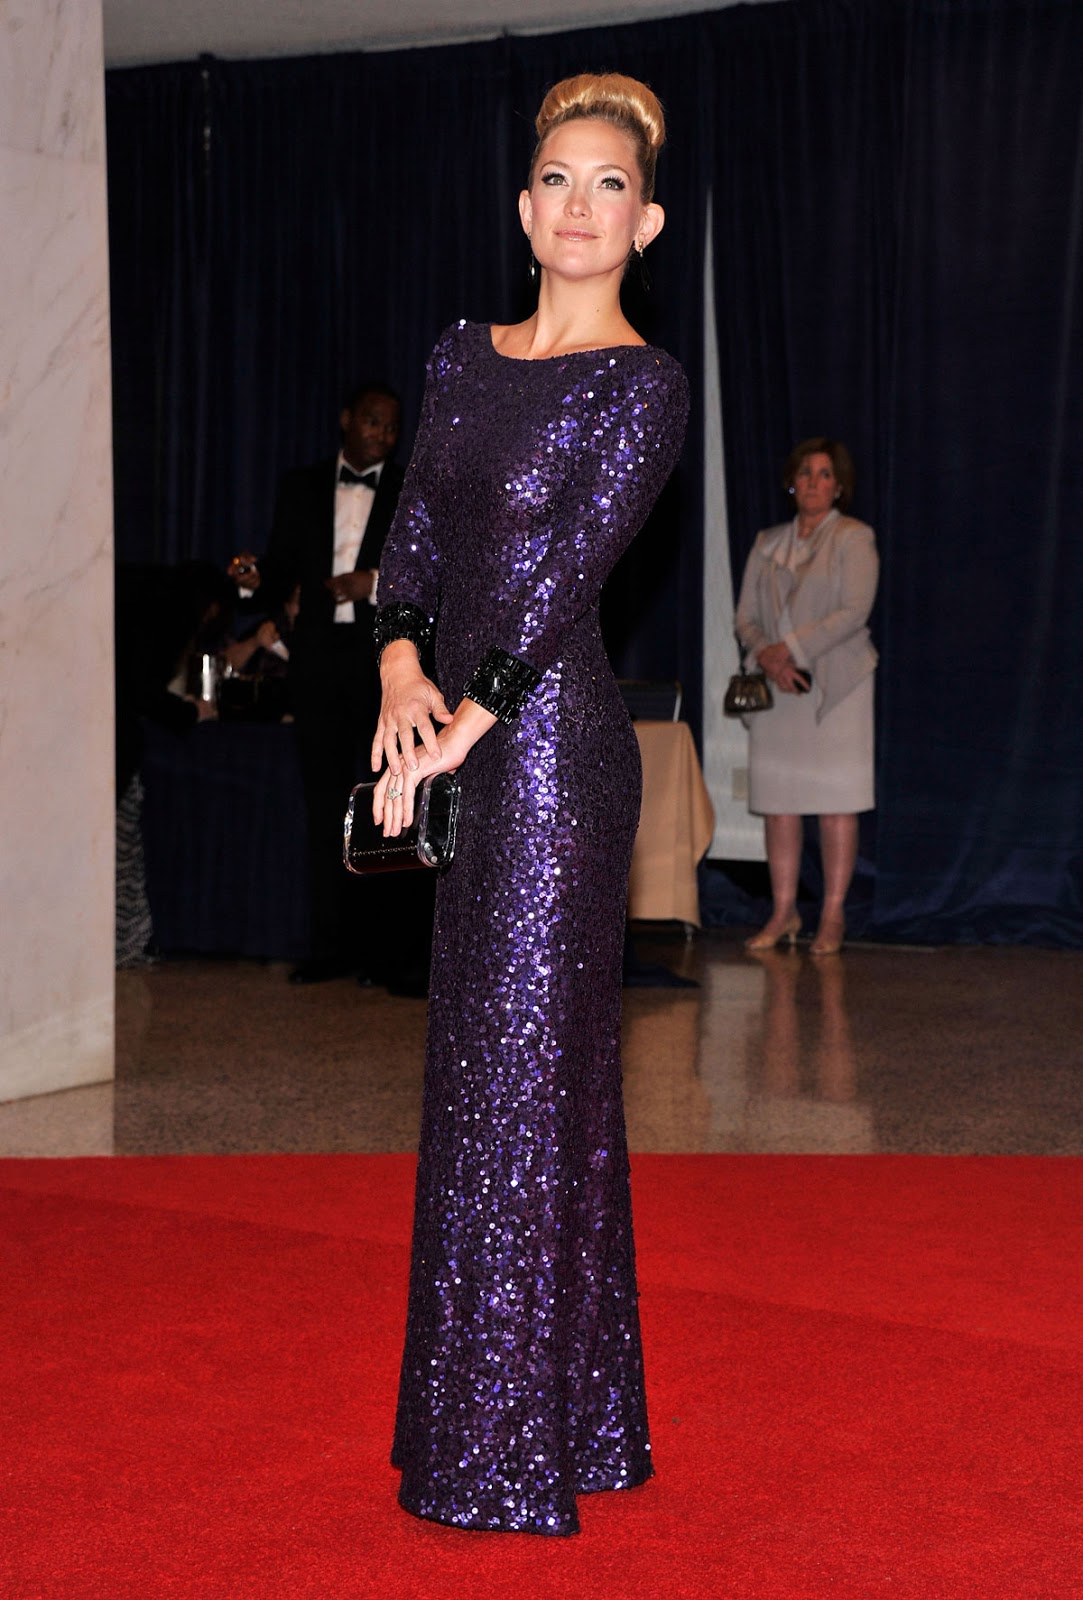 Kate Hudson At 2012 White House Correspondents Association Dinner In Washington